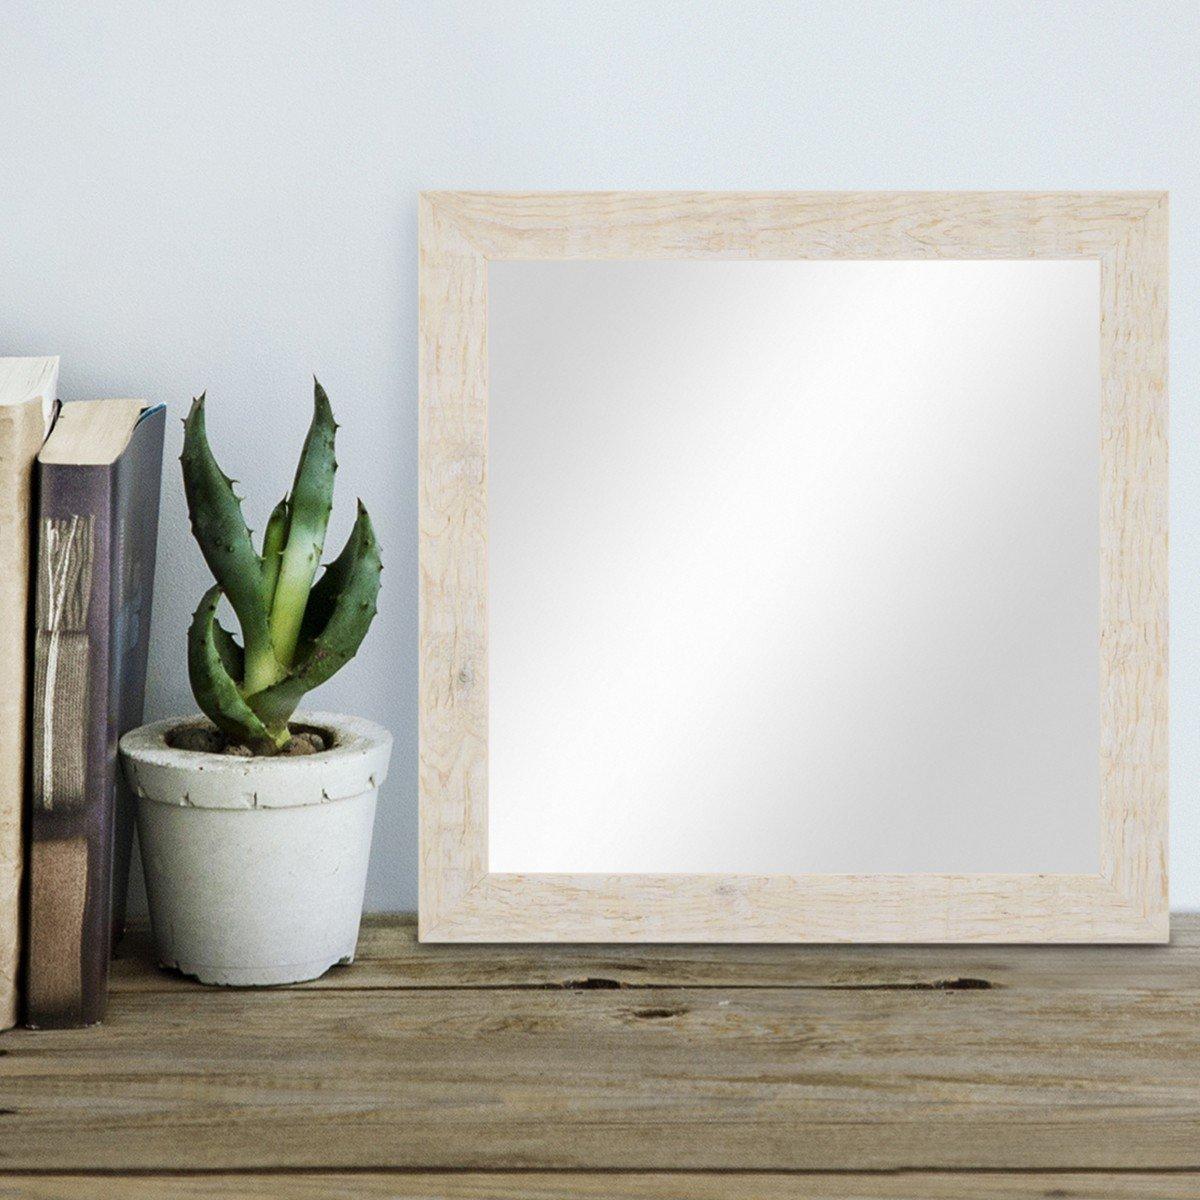 PHOTOLINI Wand-Spiegel 30x30 cm im Massivholz-Rahmen Strandhaus-Stil ...